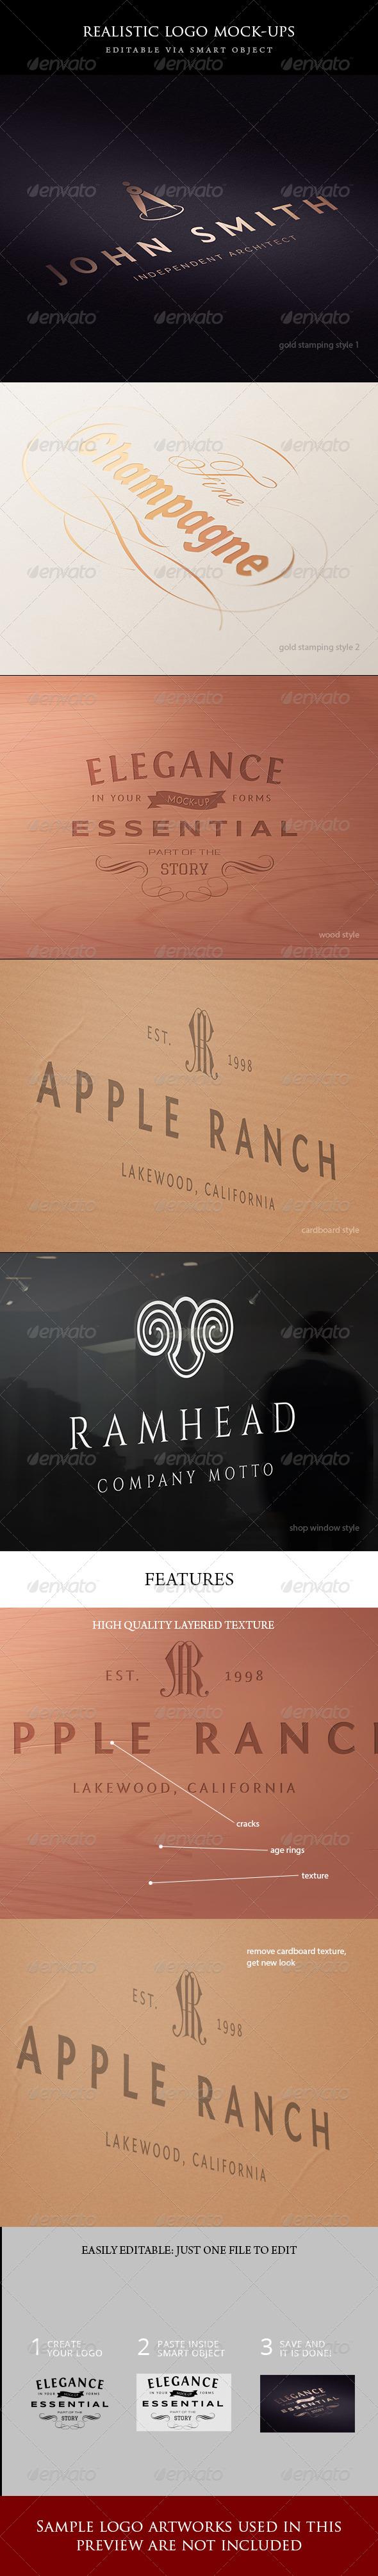 5 logo mock-ups - Logo Product Mock-Ups